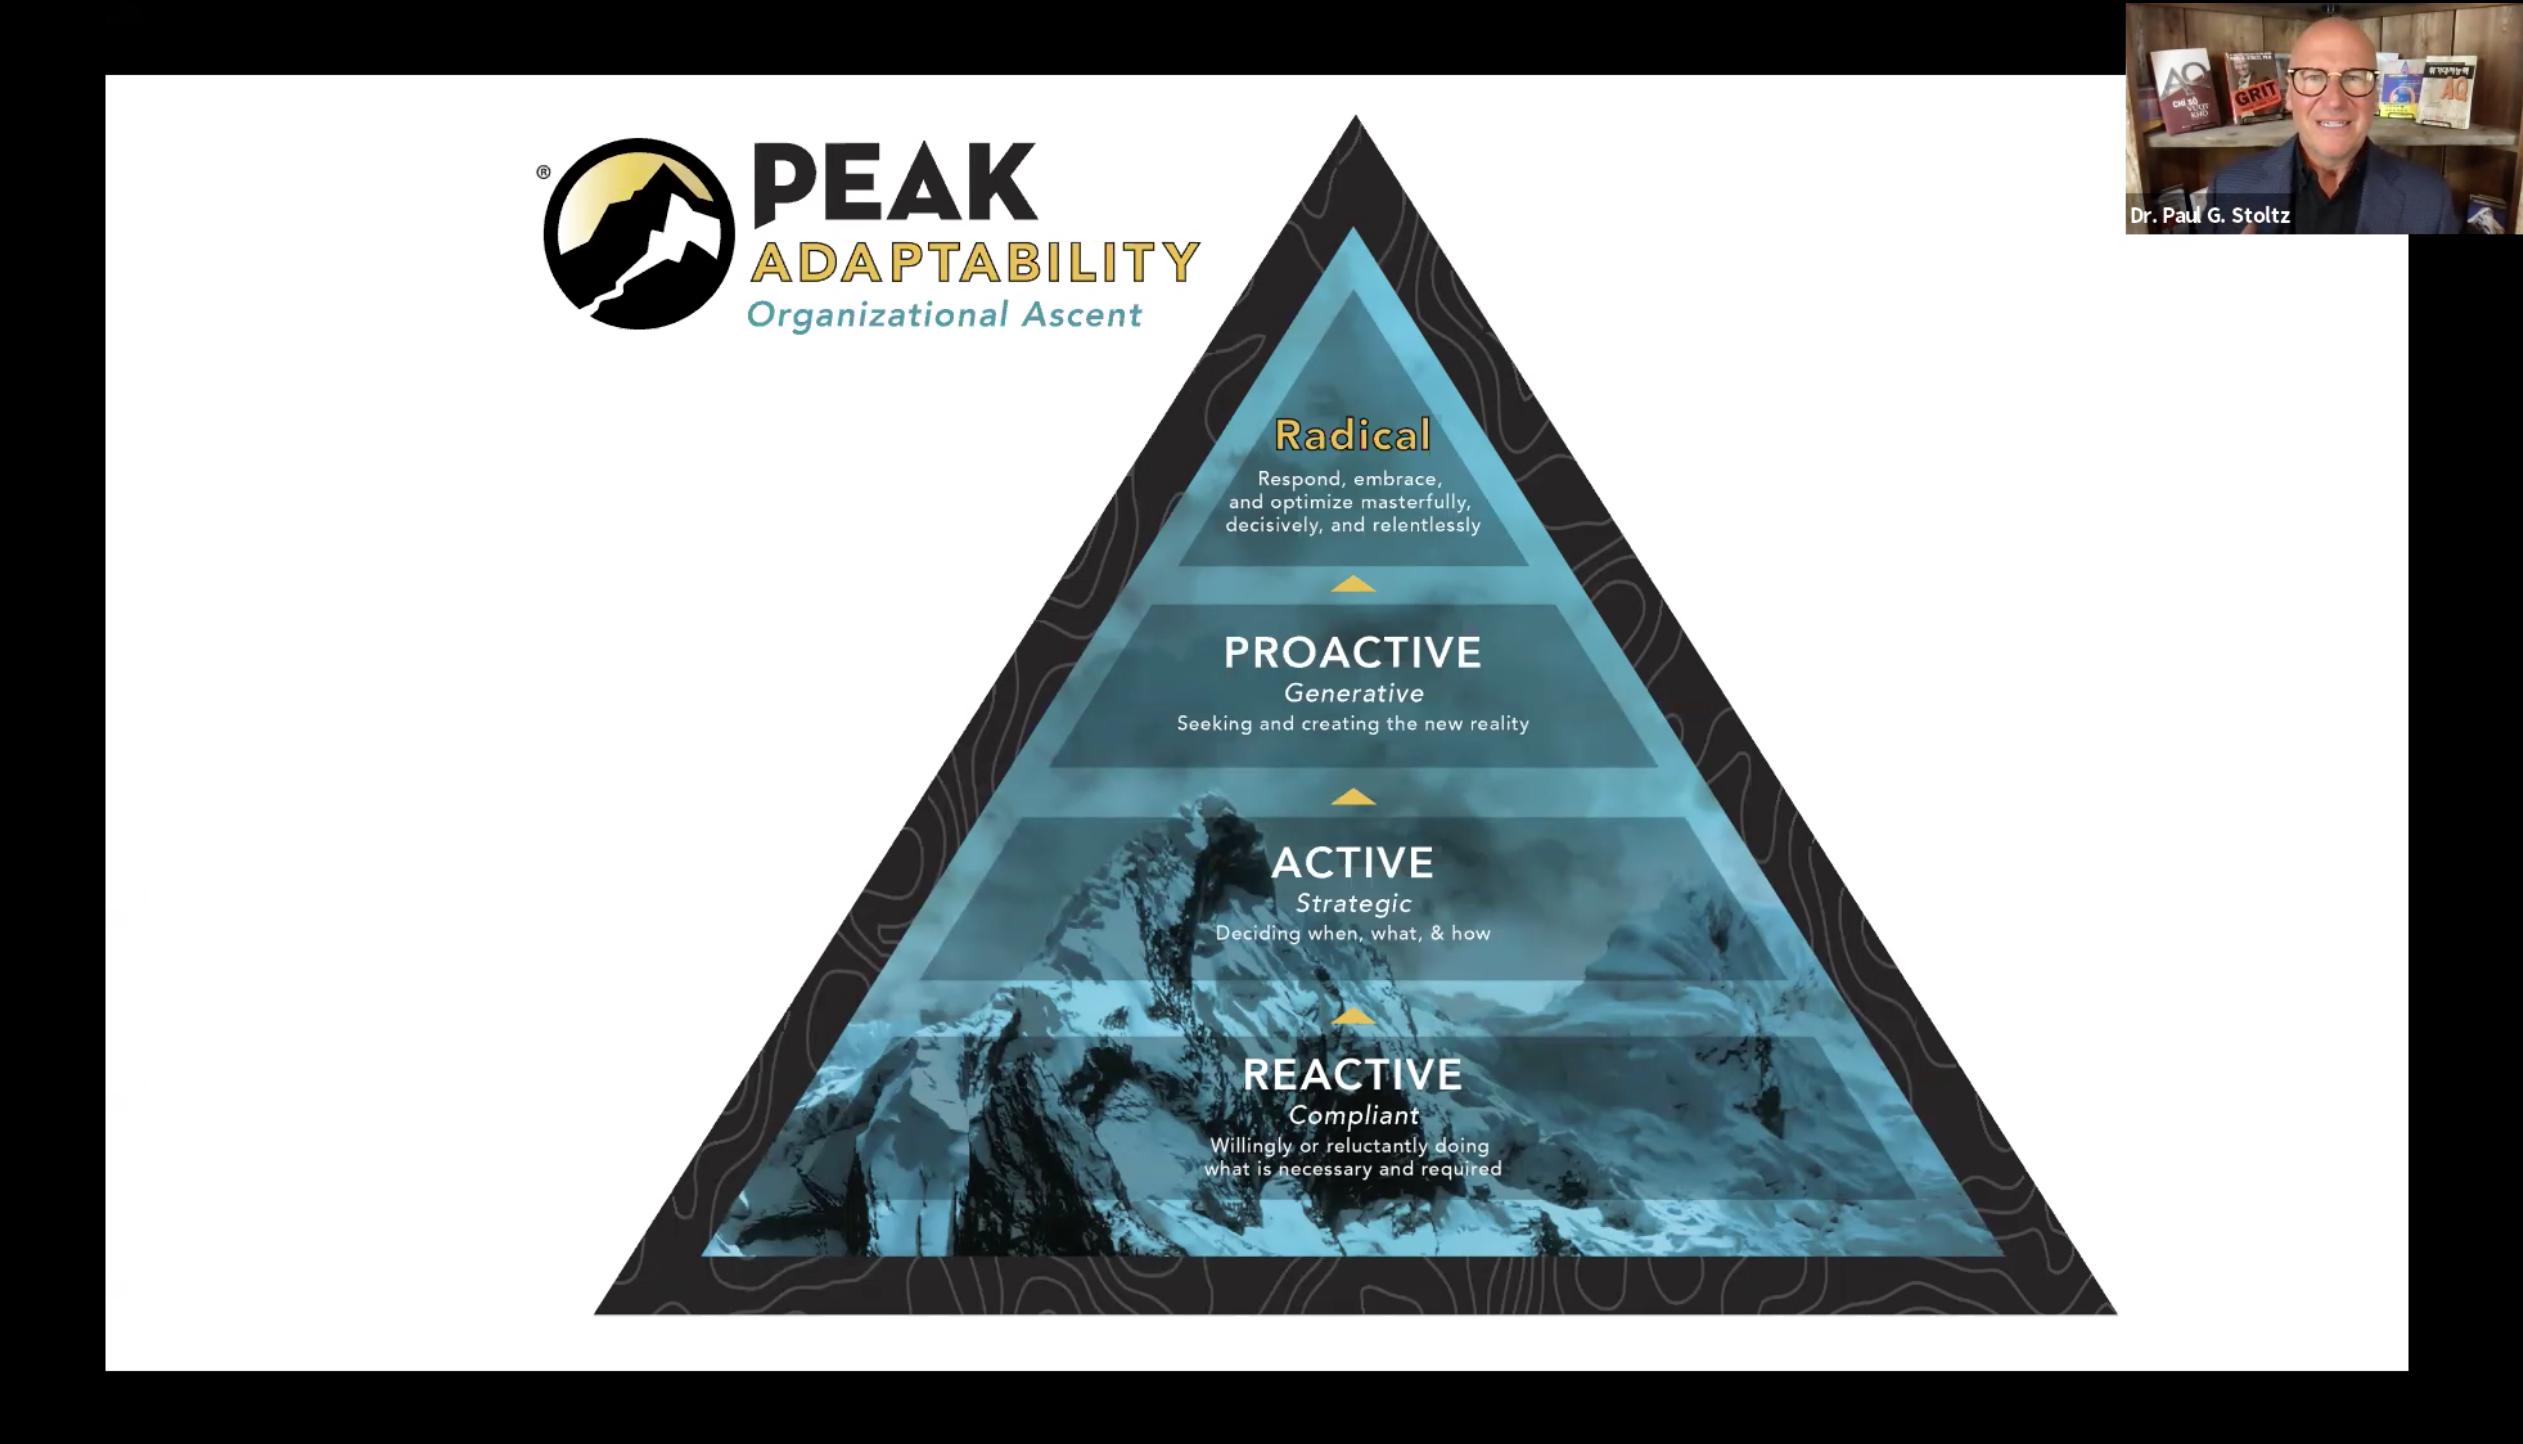 What is radical or PEAK Adaptability?